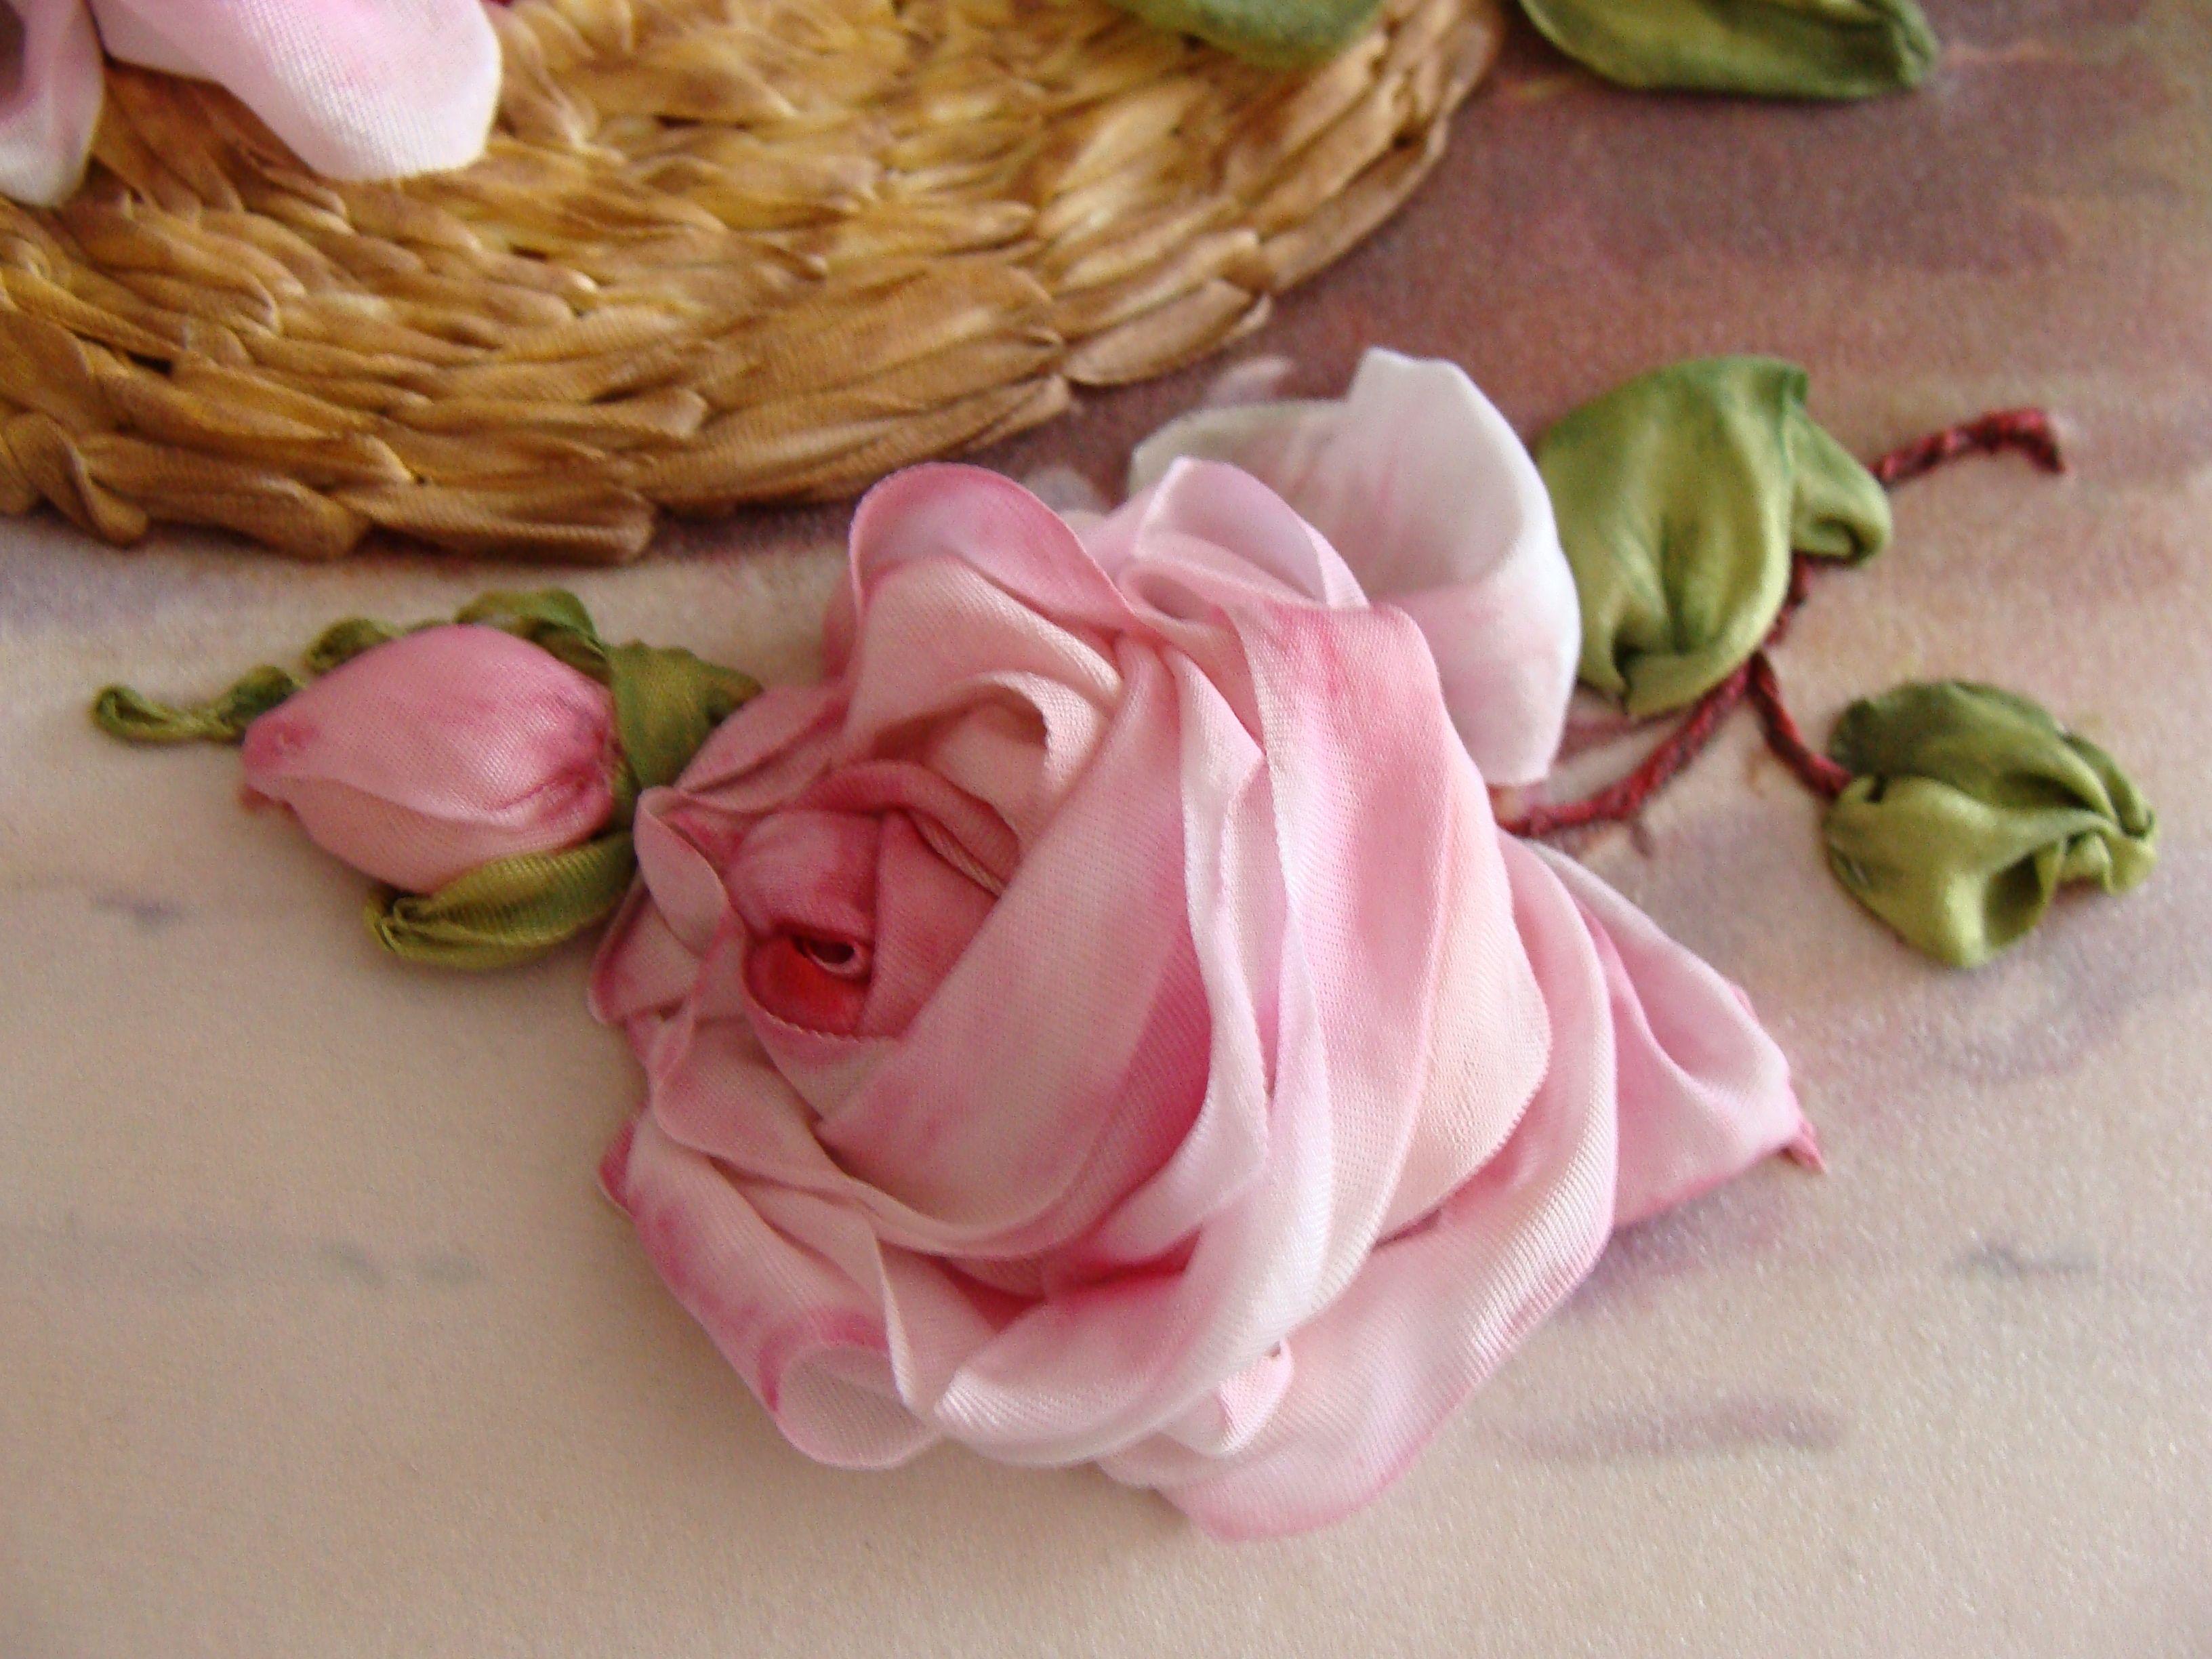 Silk Ribbon Rose By Tatina Popova Of Kiev Ukraine Folding And